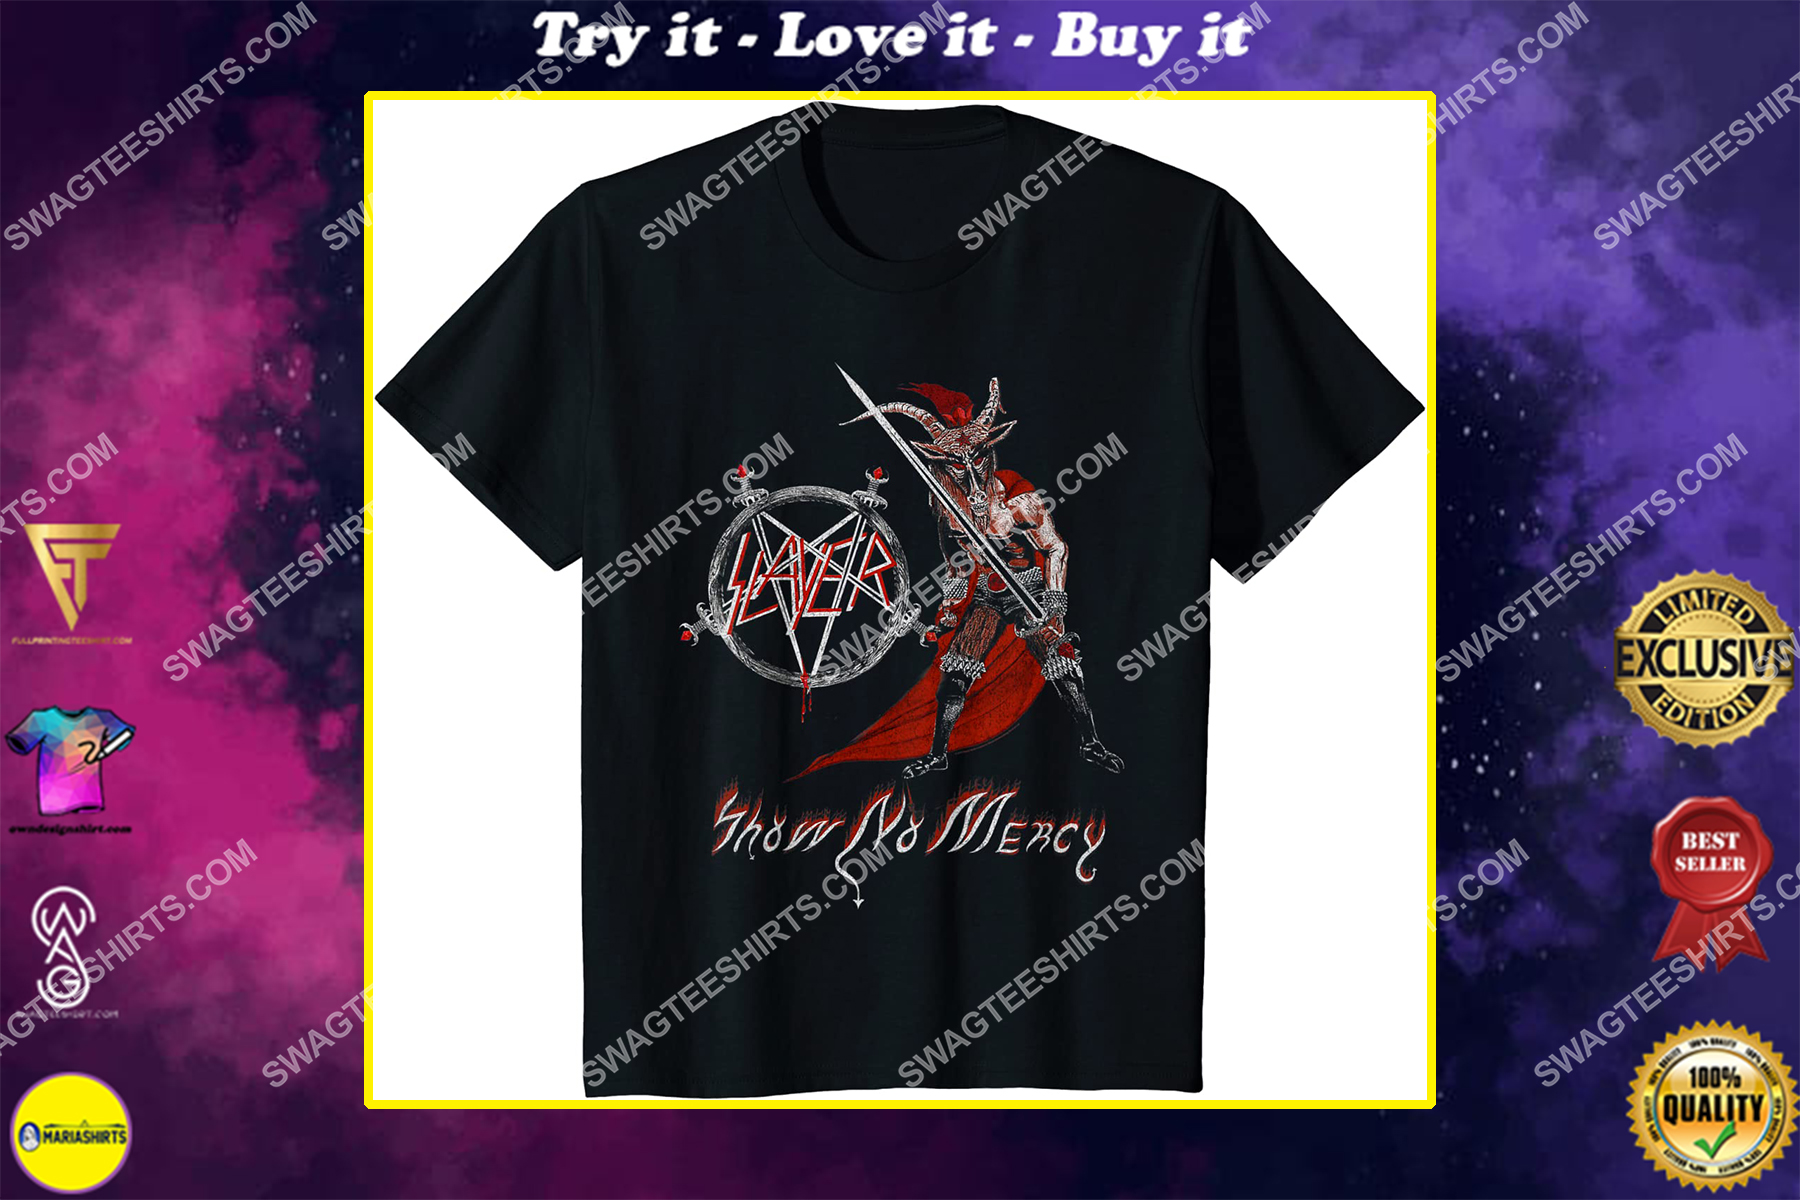 the slayer rock band show no mercy shirt